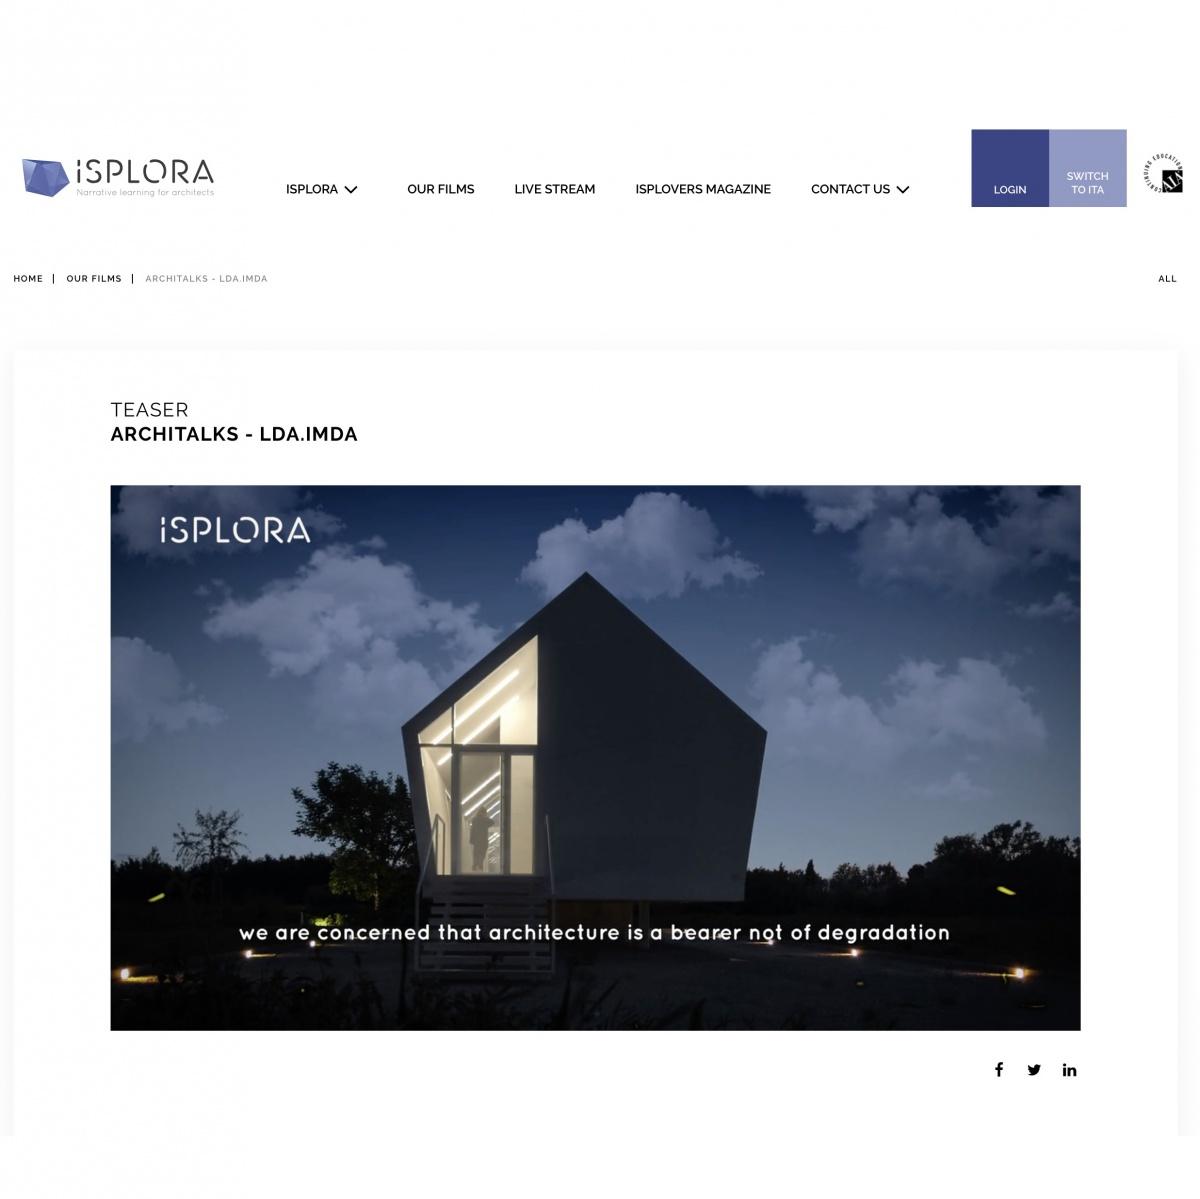 https://www.ldaimda.com/ArchiTalk-LDAiMdA-isplora.htm